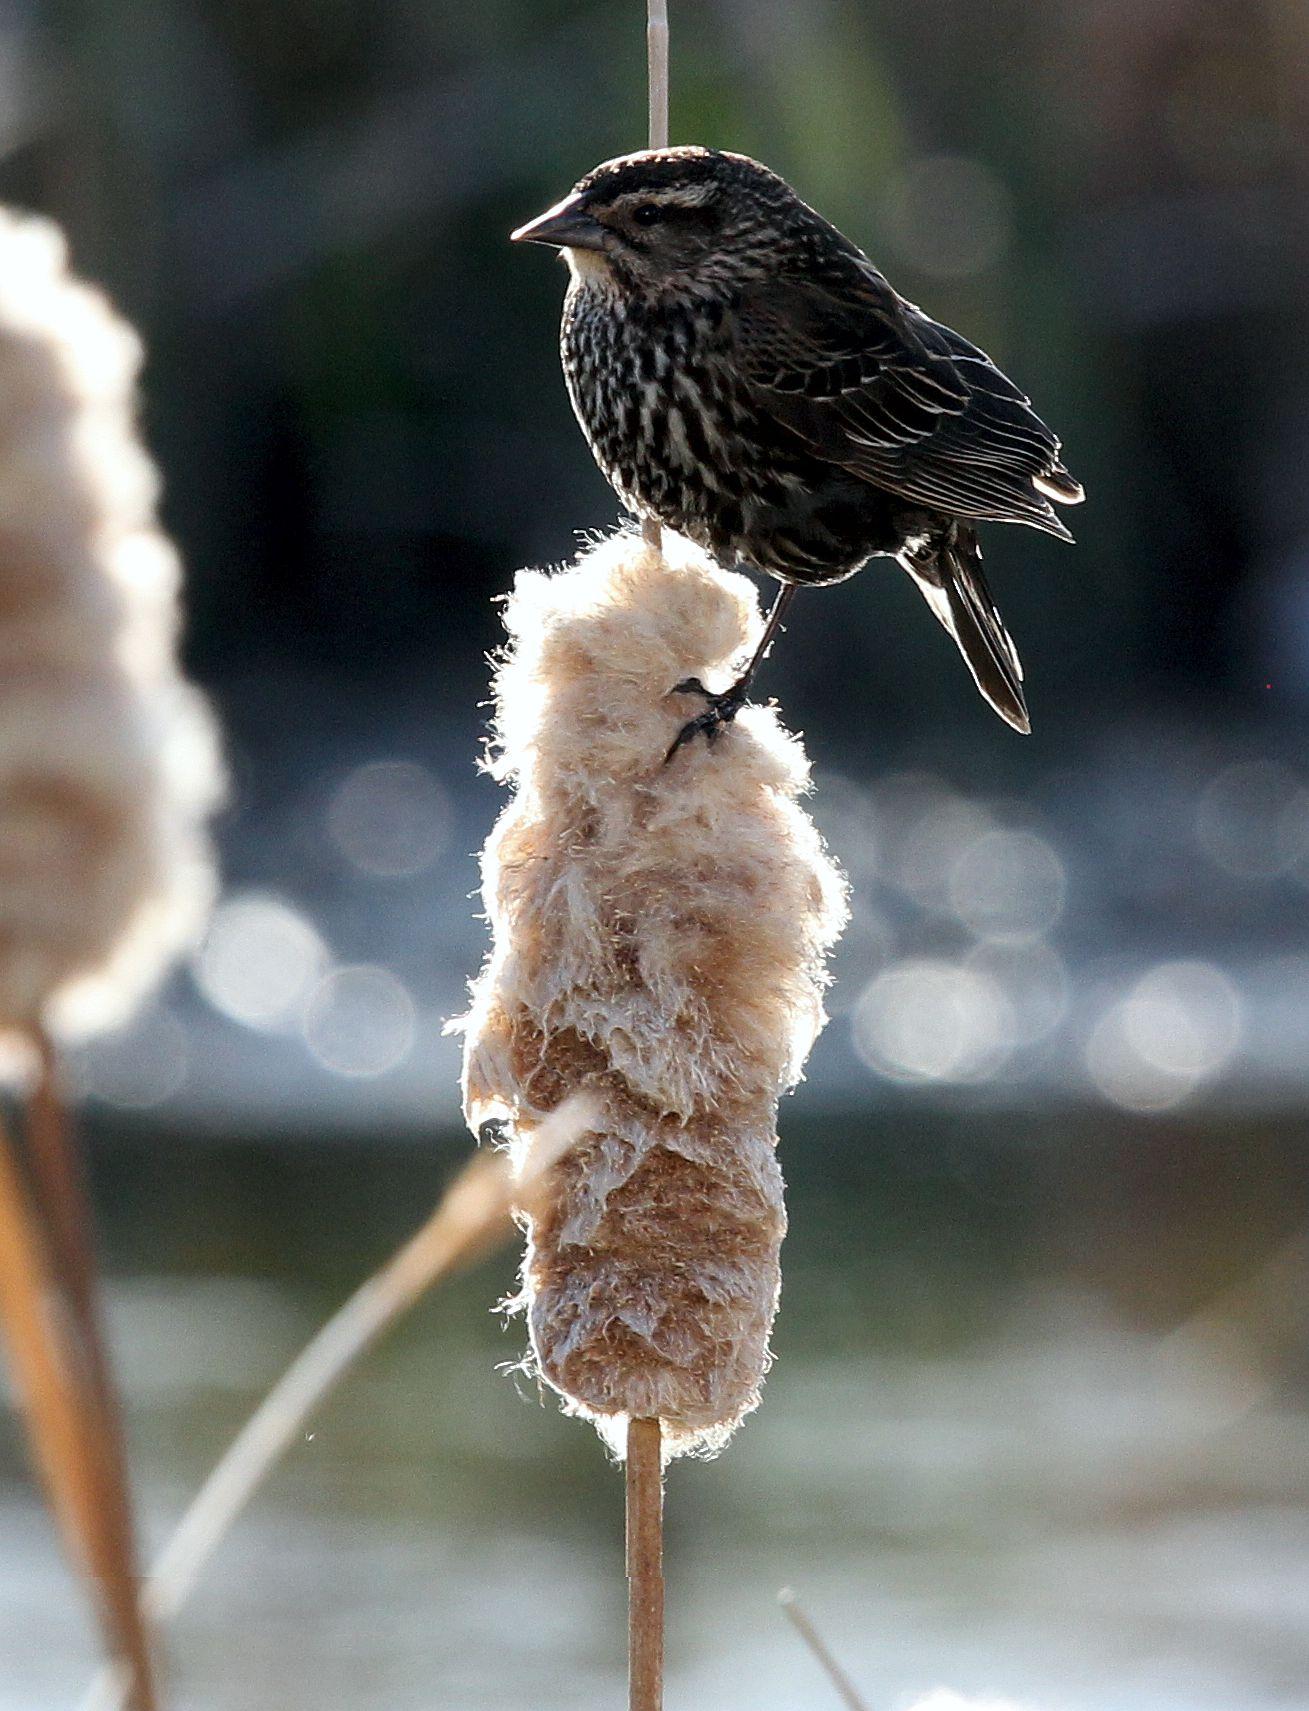 Small bird...